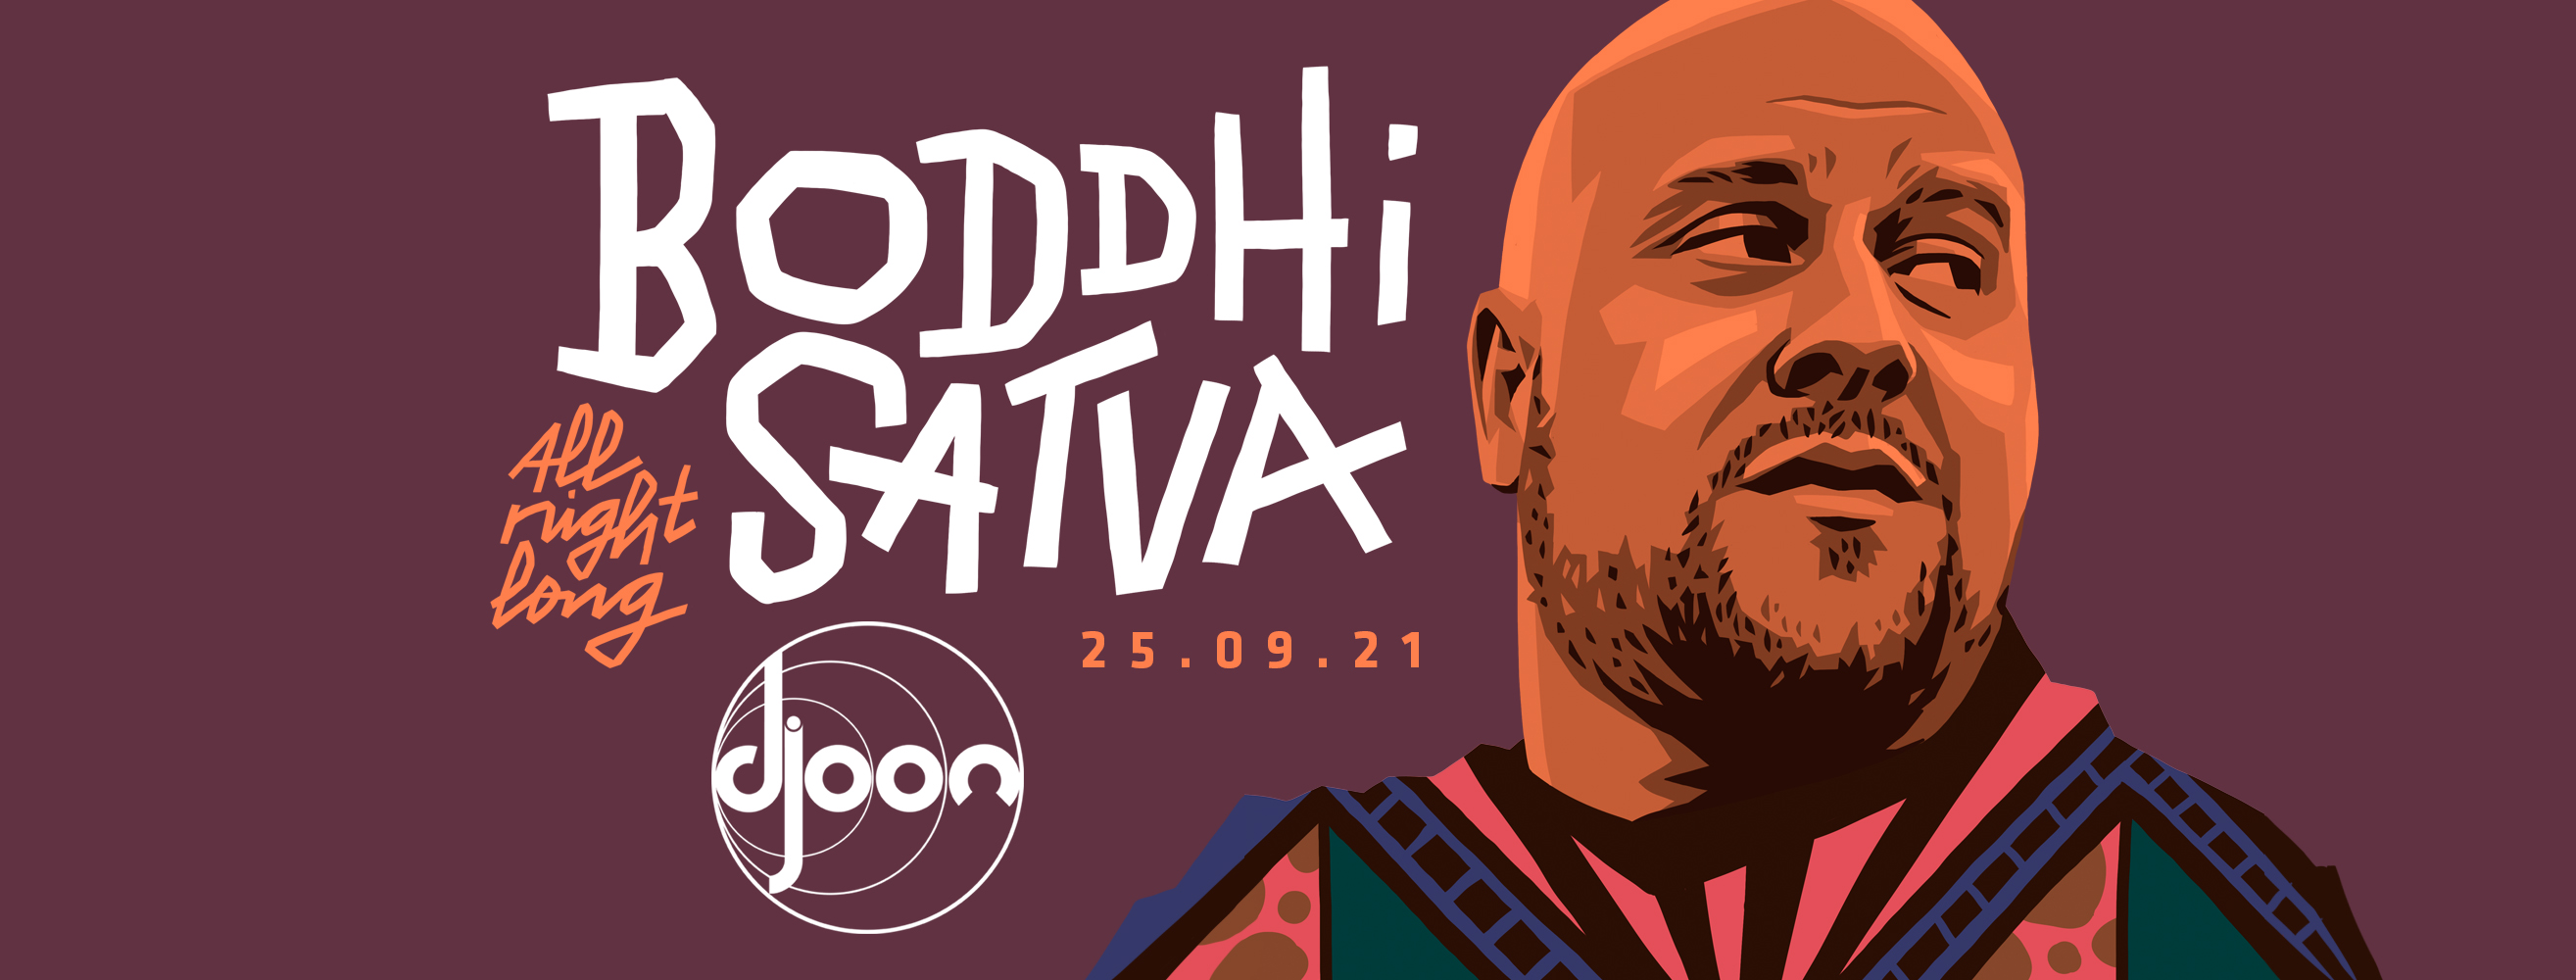 Djoon: Boddhi Satva all night long